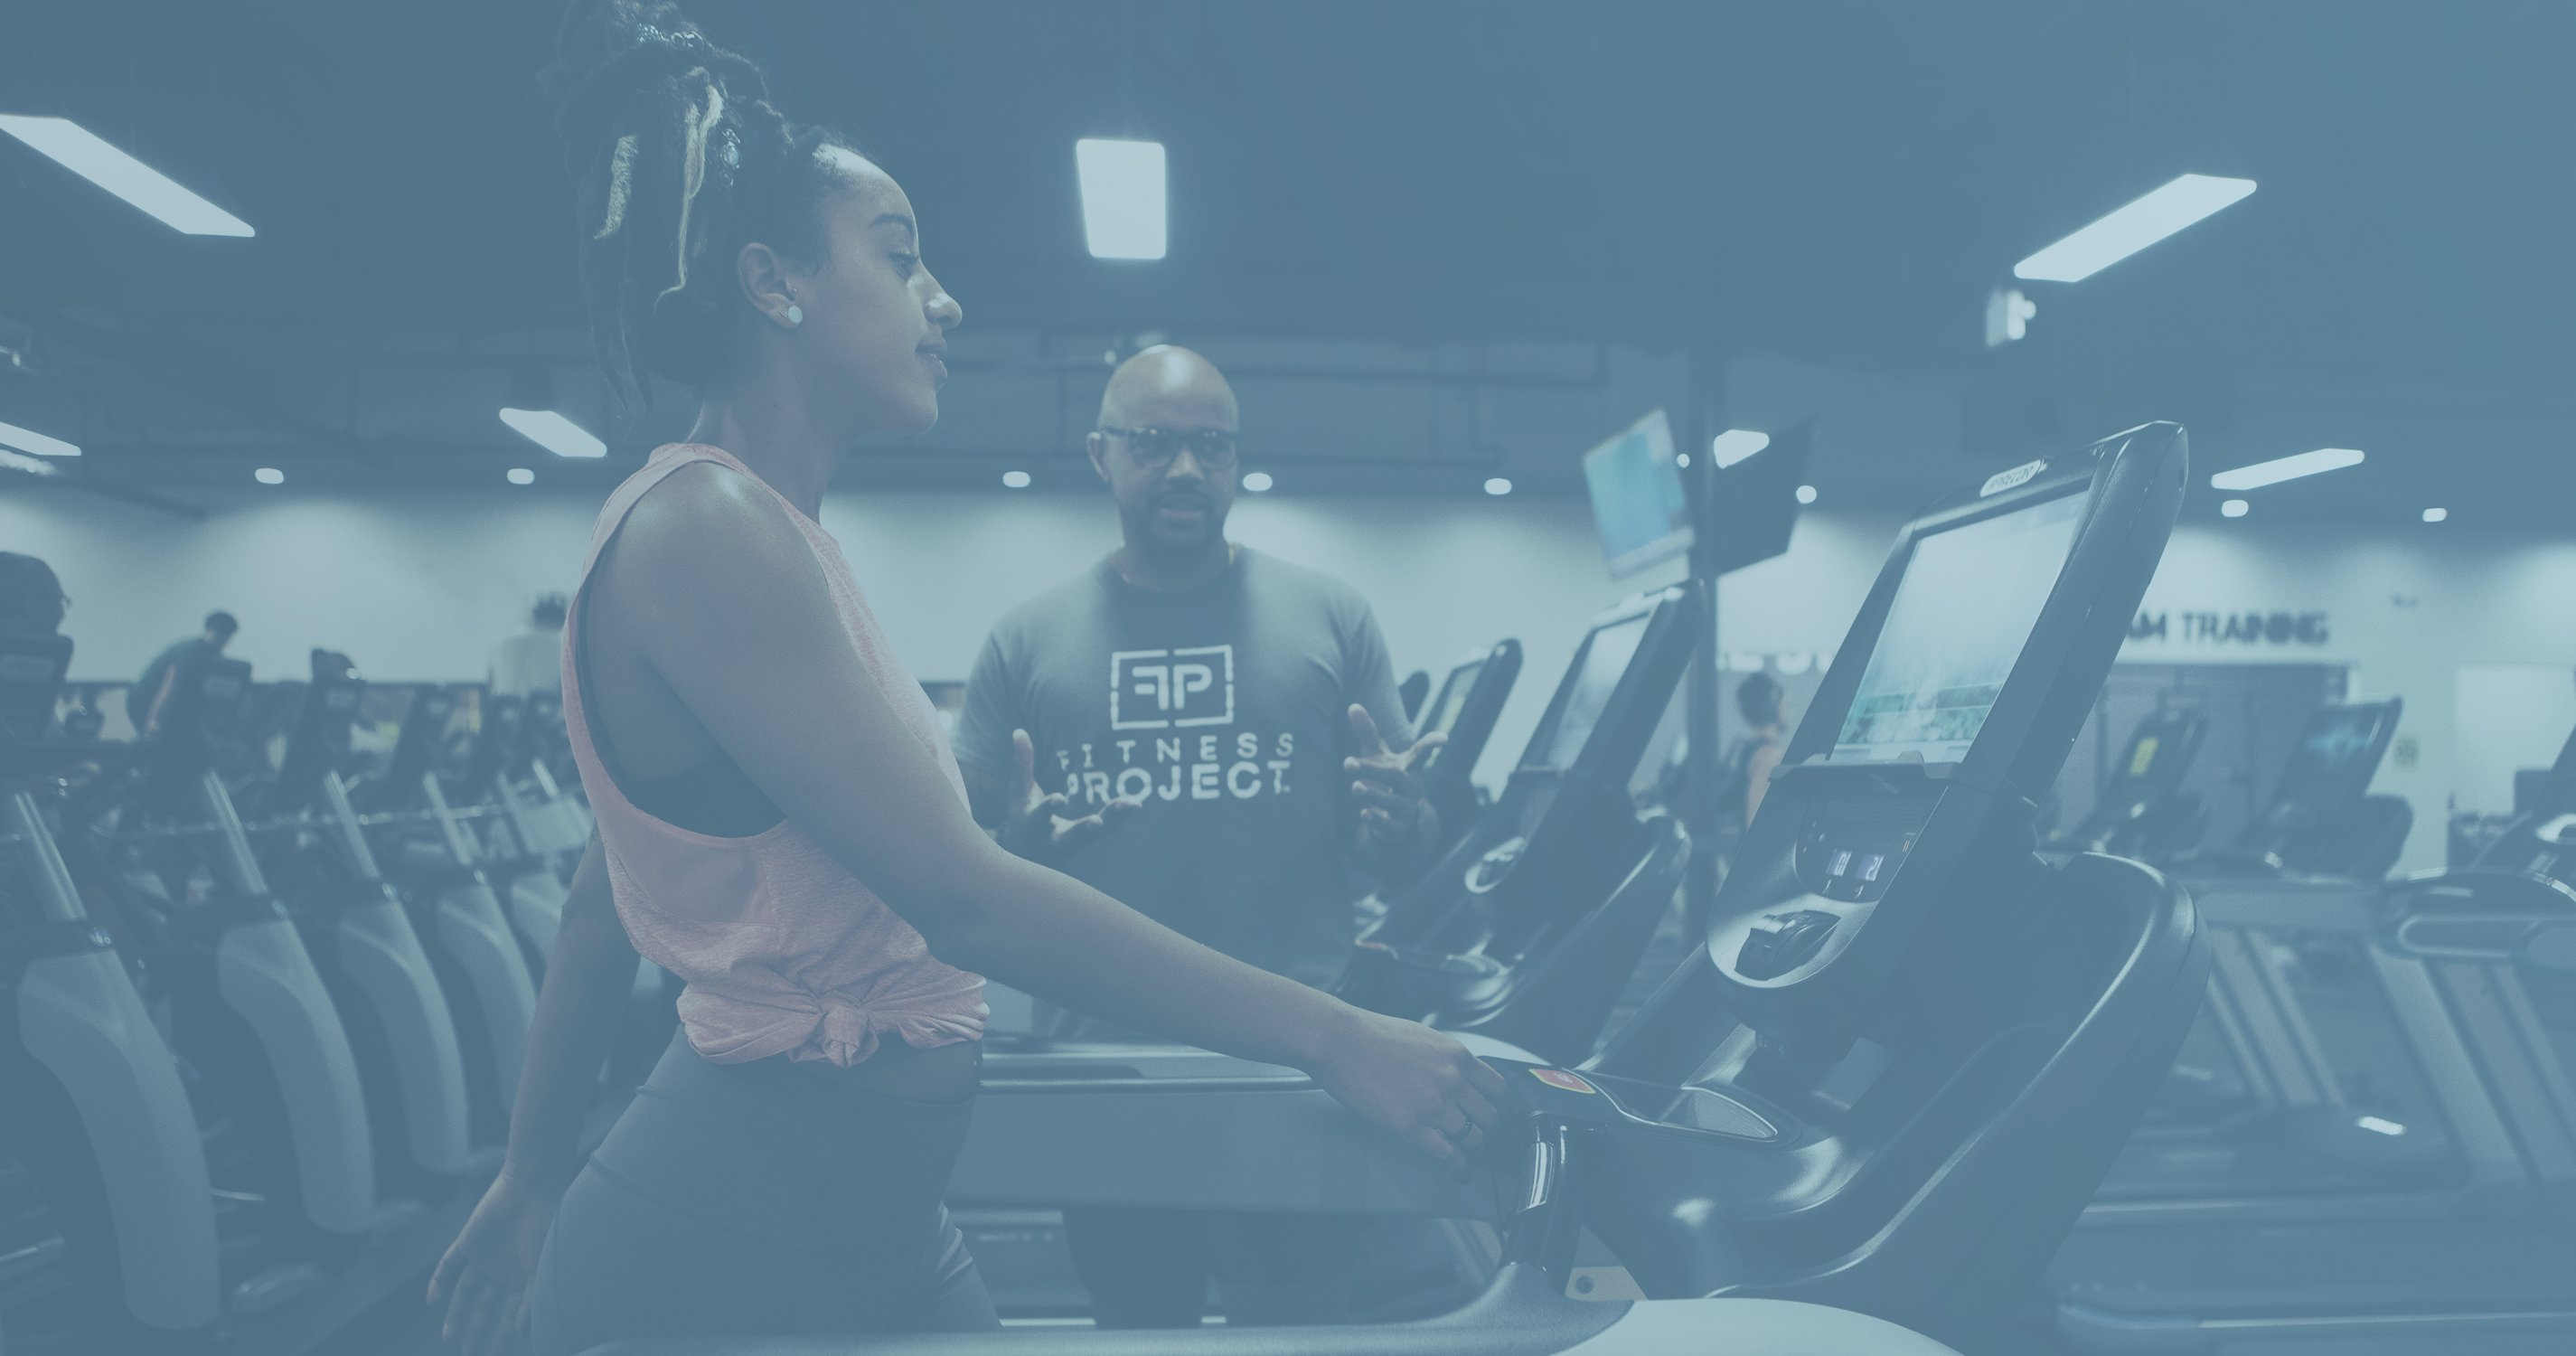 LP-FitnessPurpose